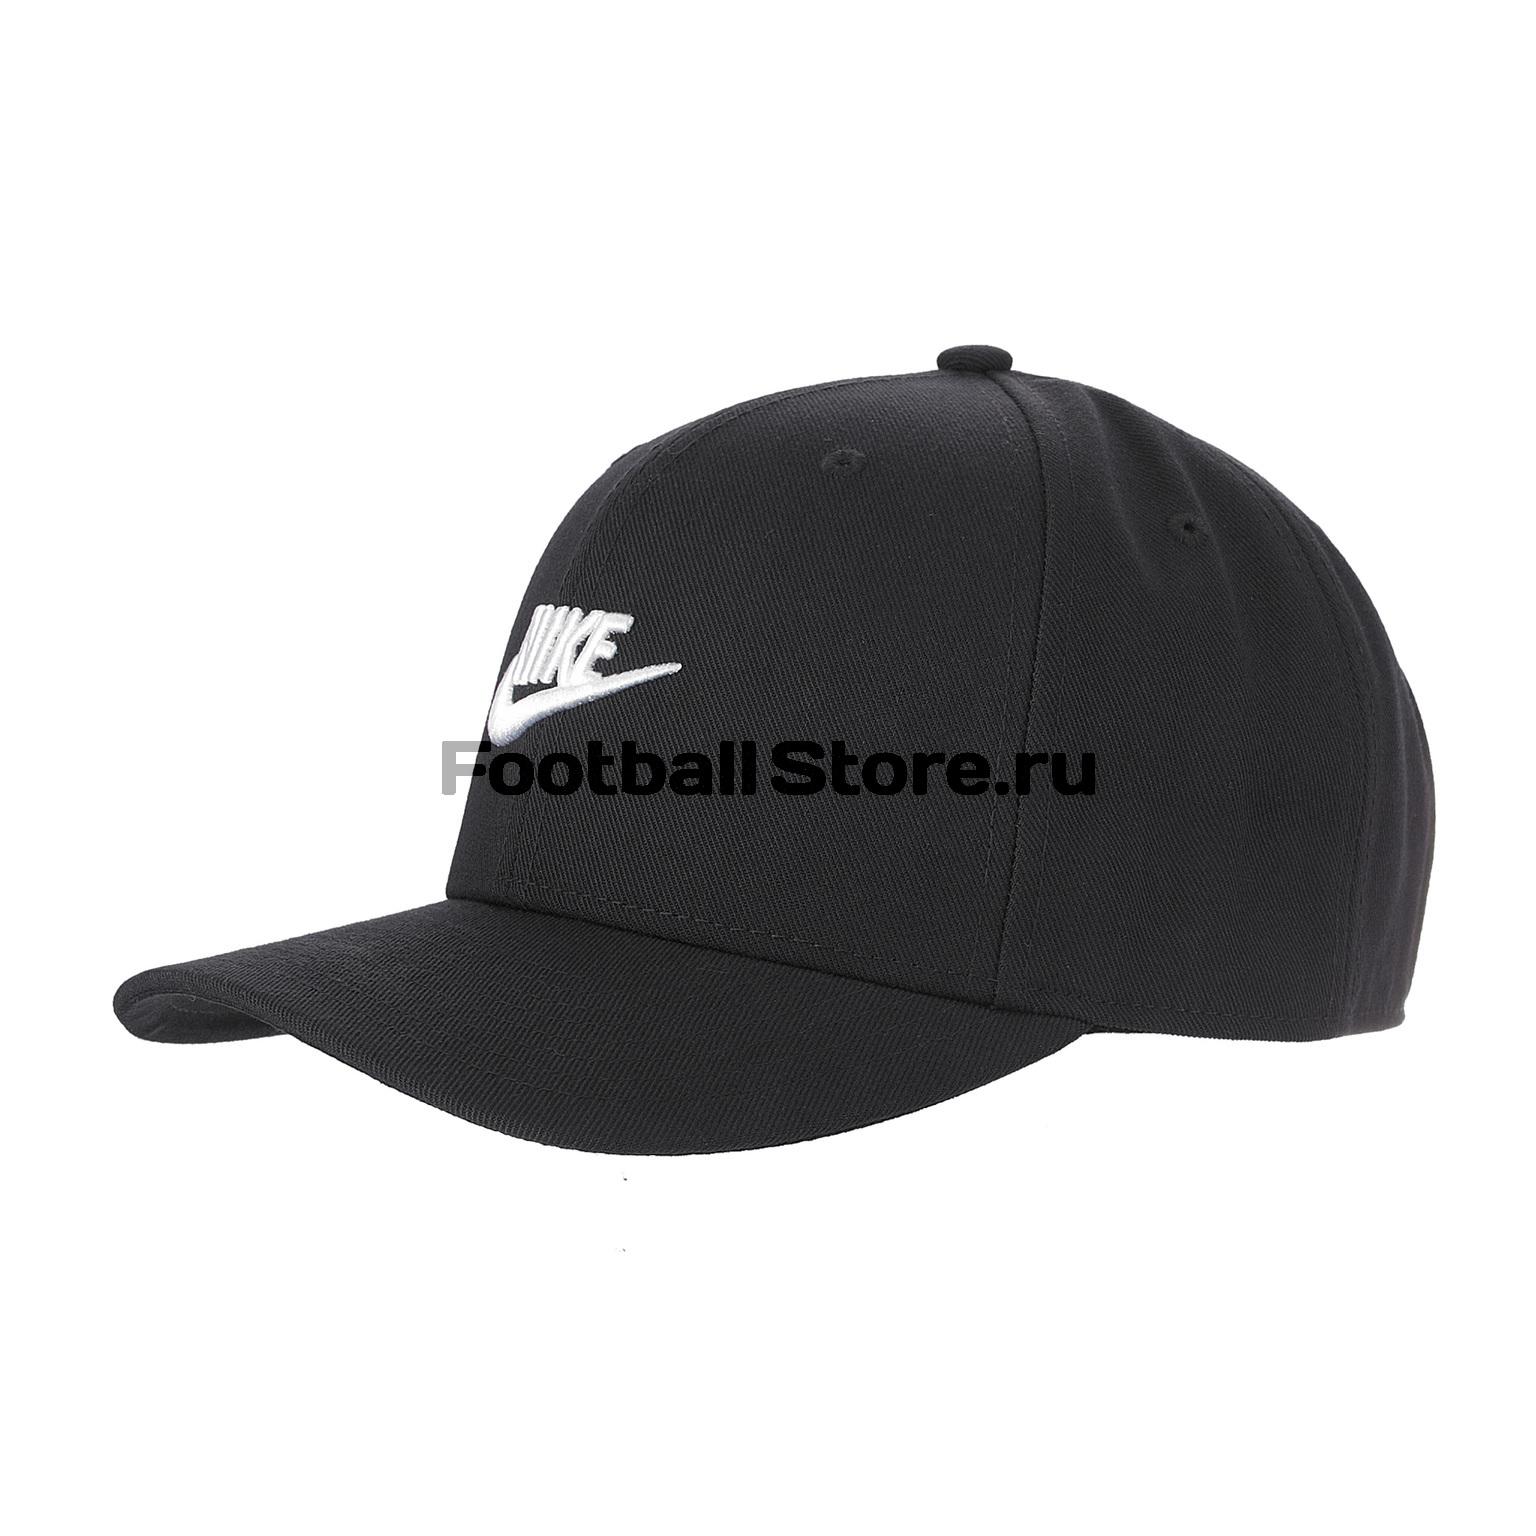 Бейсболка Nike CLC99 Cap Snapback AV6720-010